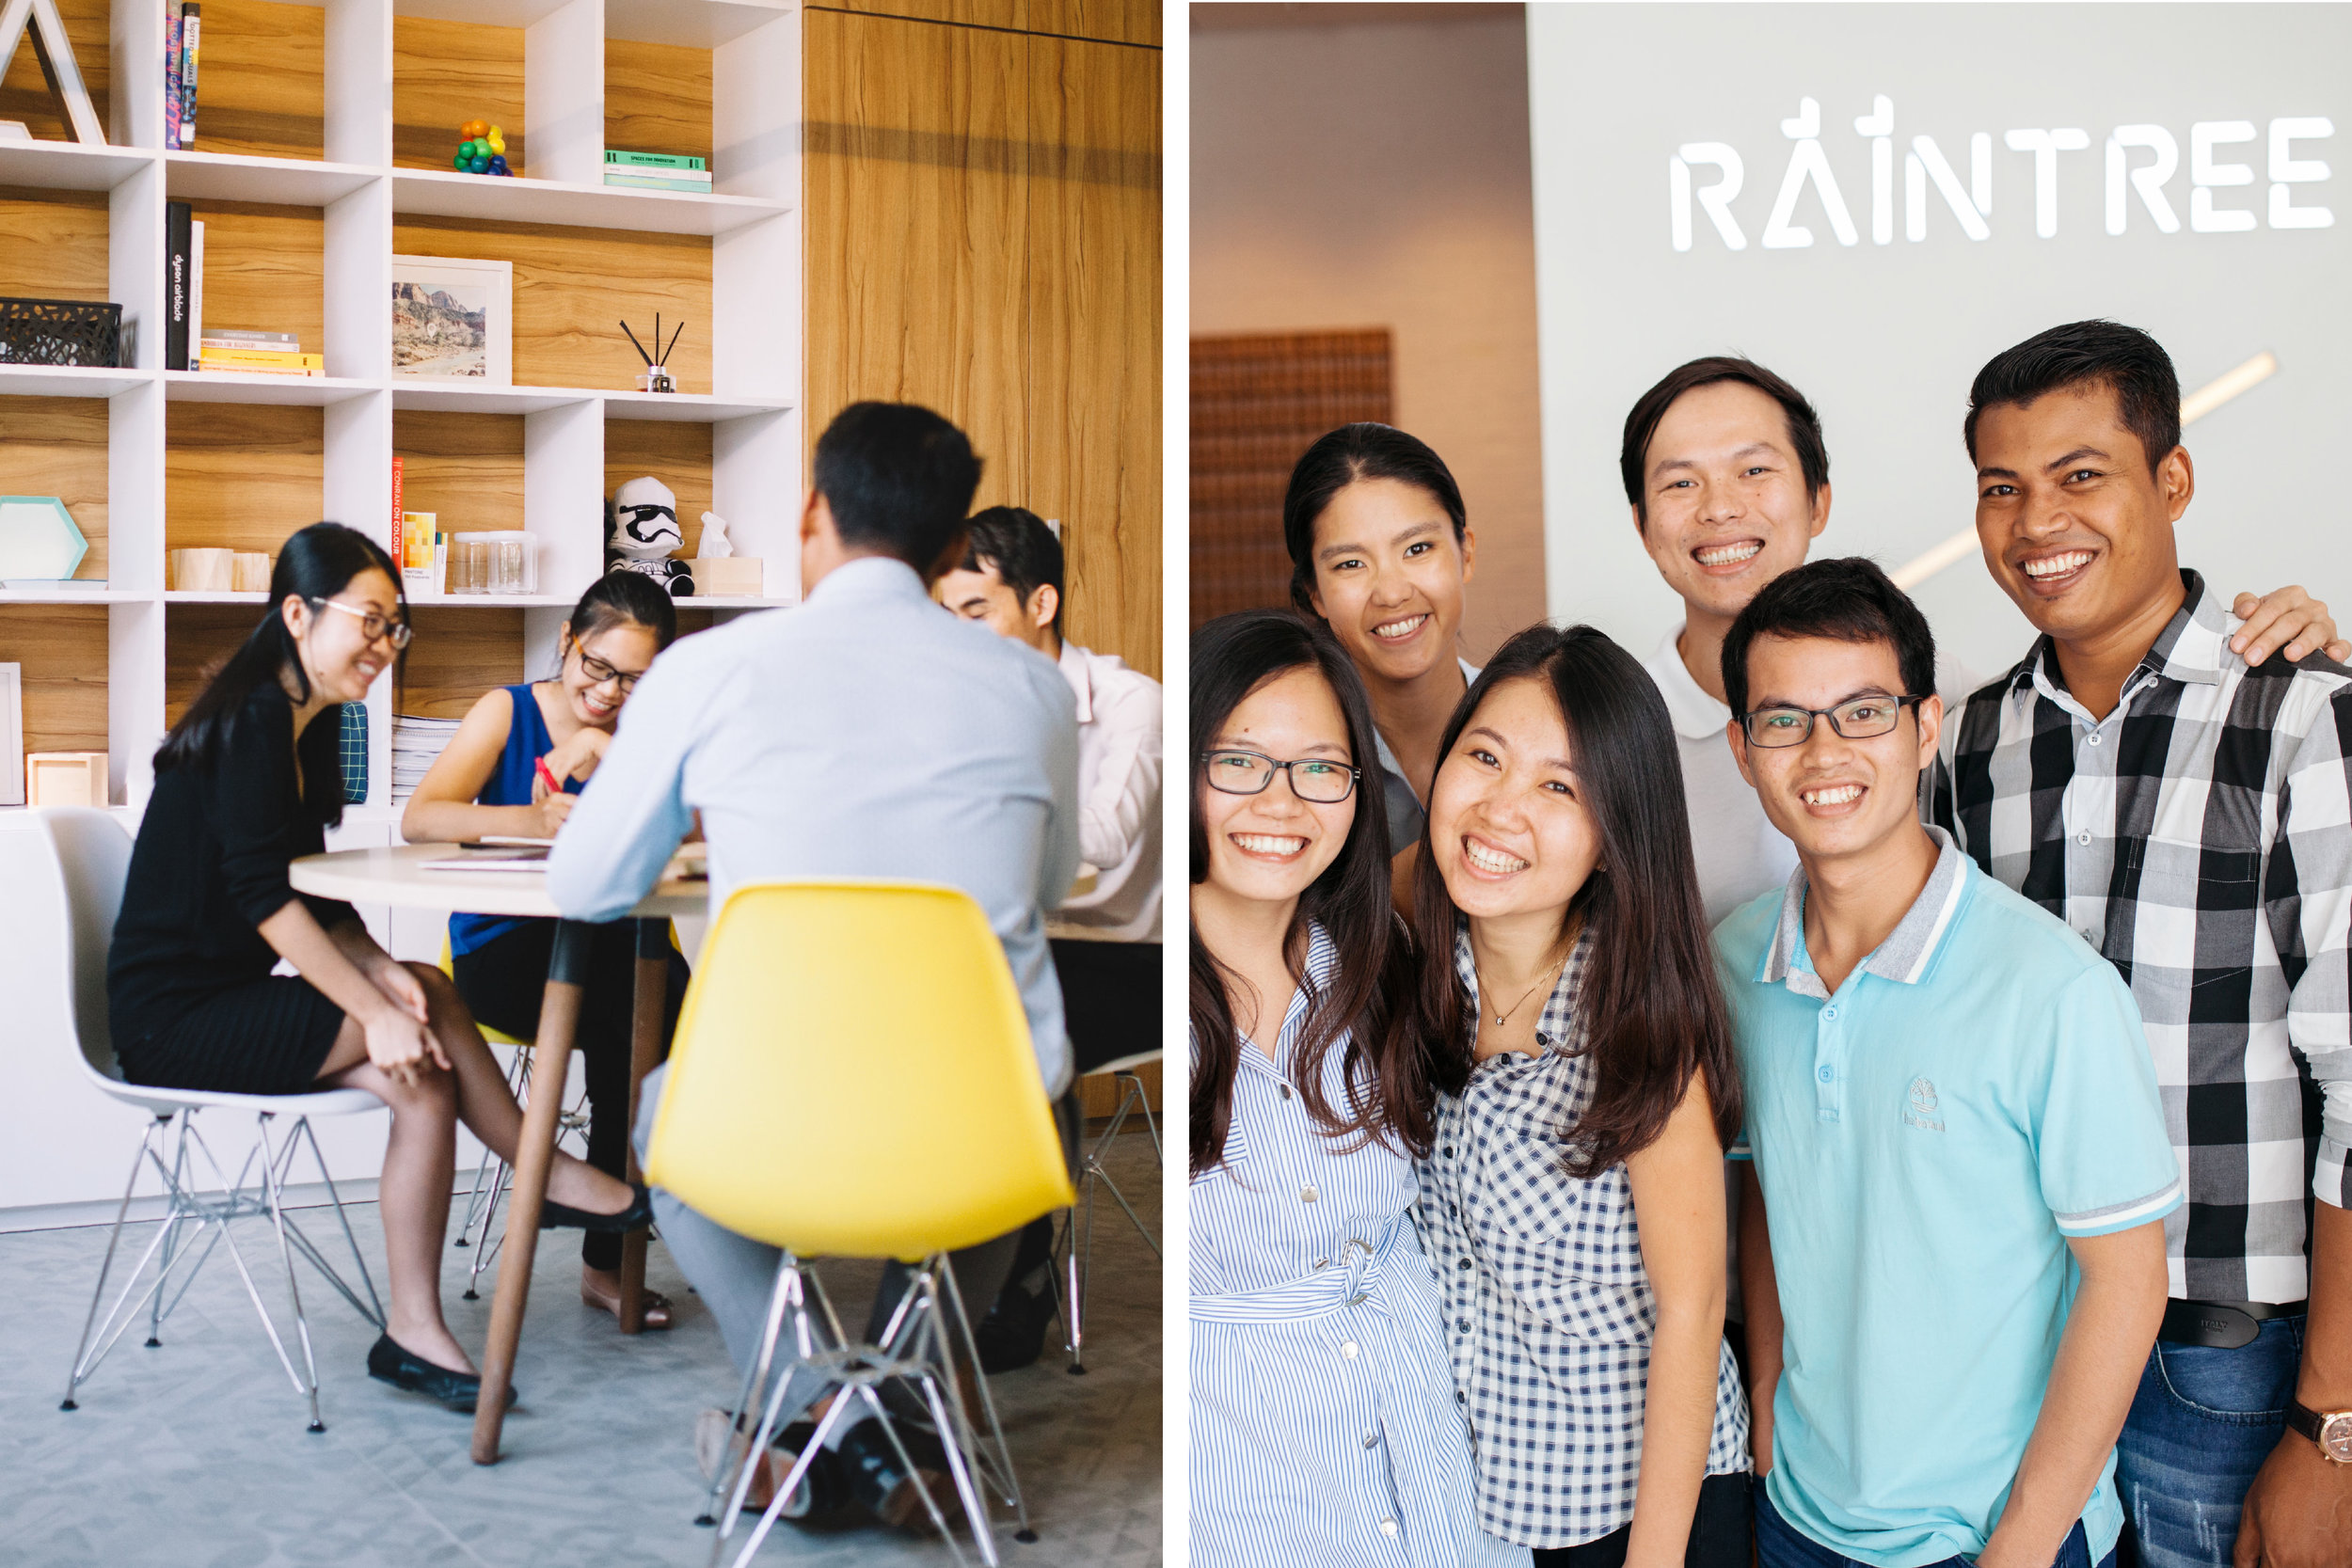 Raintree-blog-HIRING-people-marketing.jpg